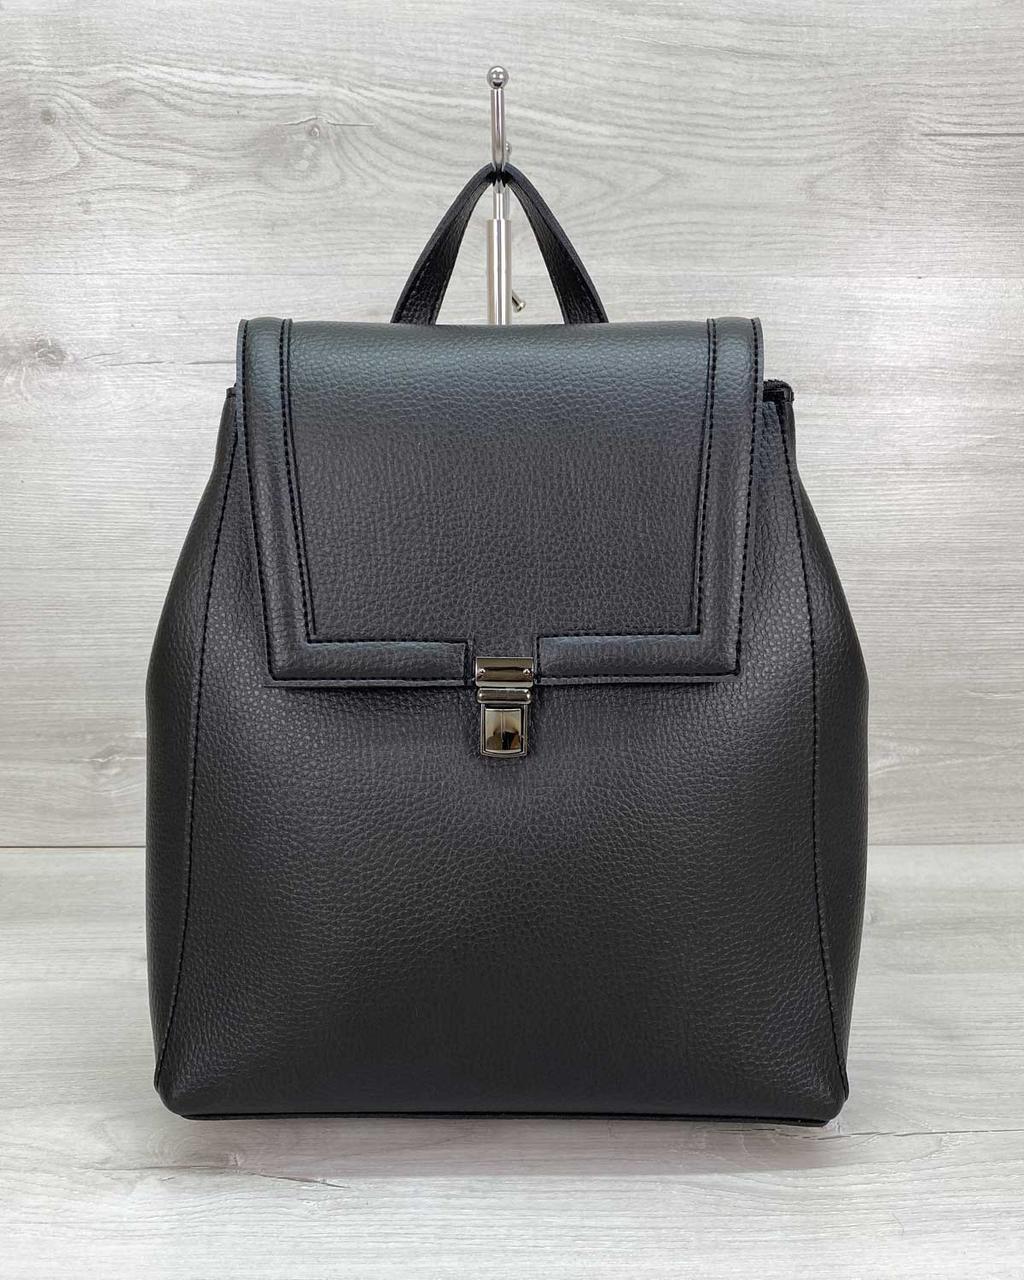 Сумка - рюкзак жіночий 32*27 WeLassie